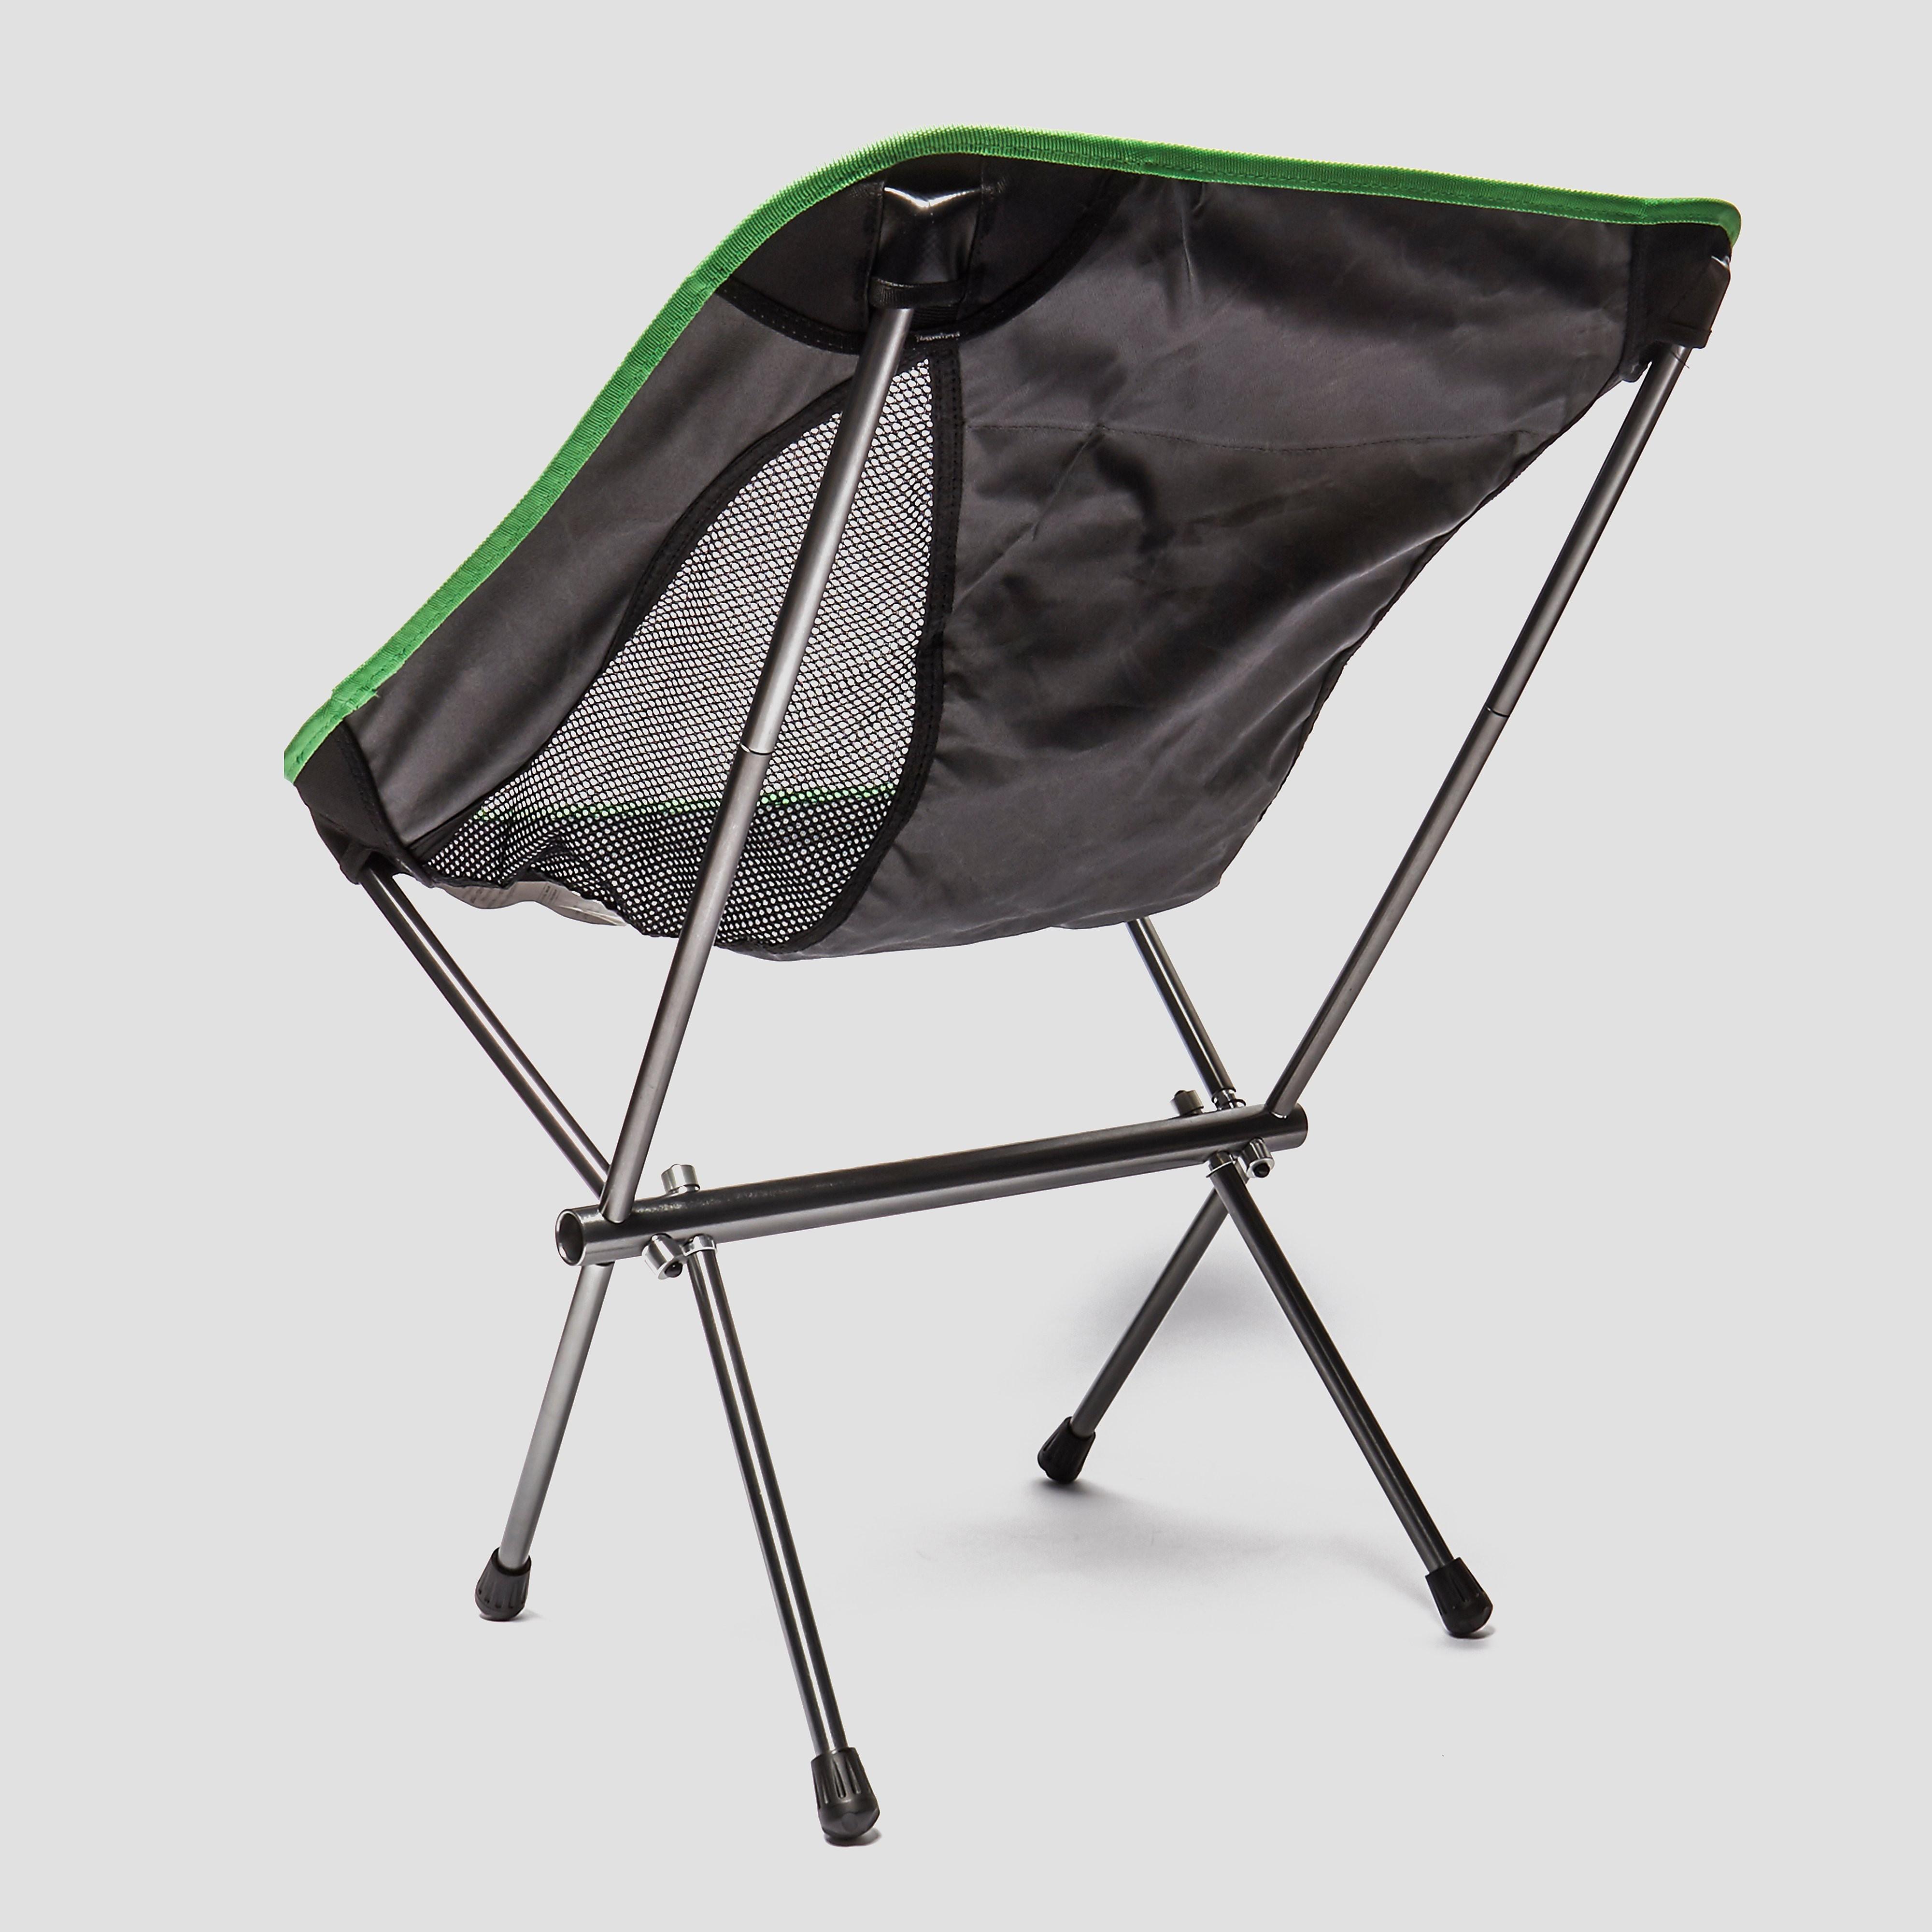 Vango Vango Microlite Chair